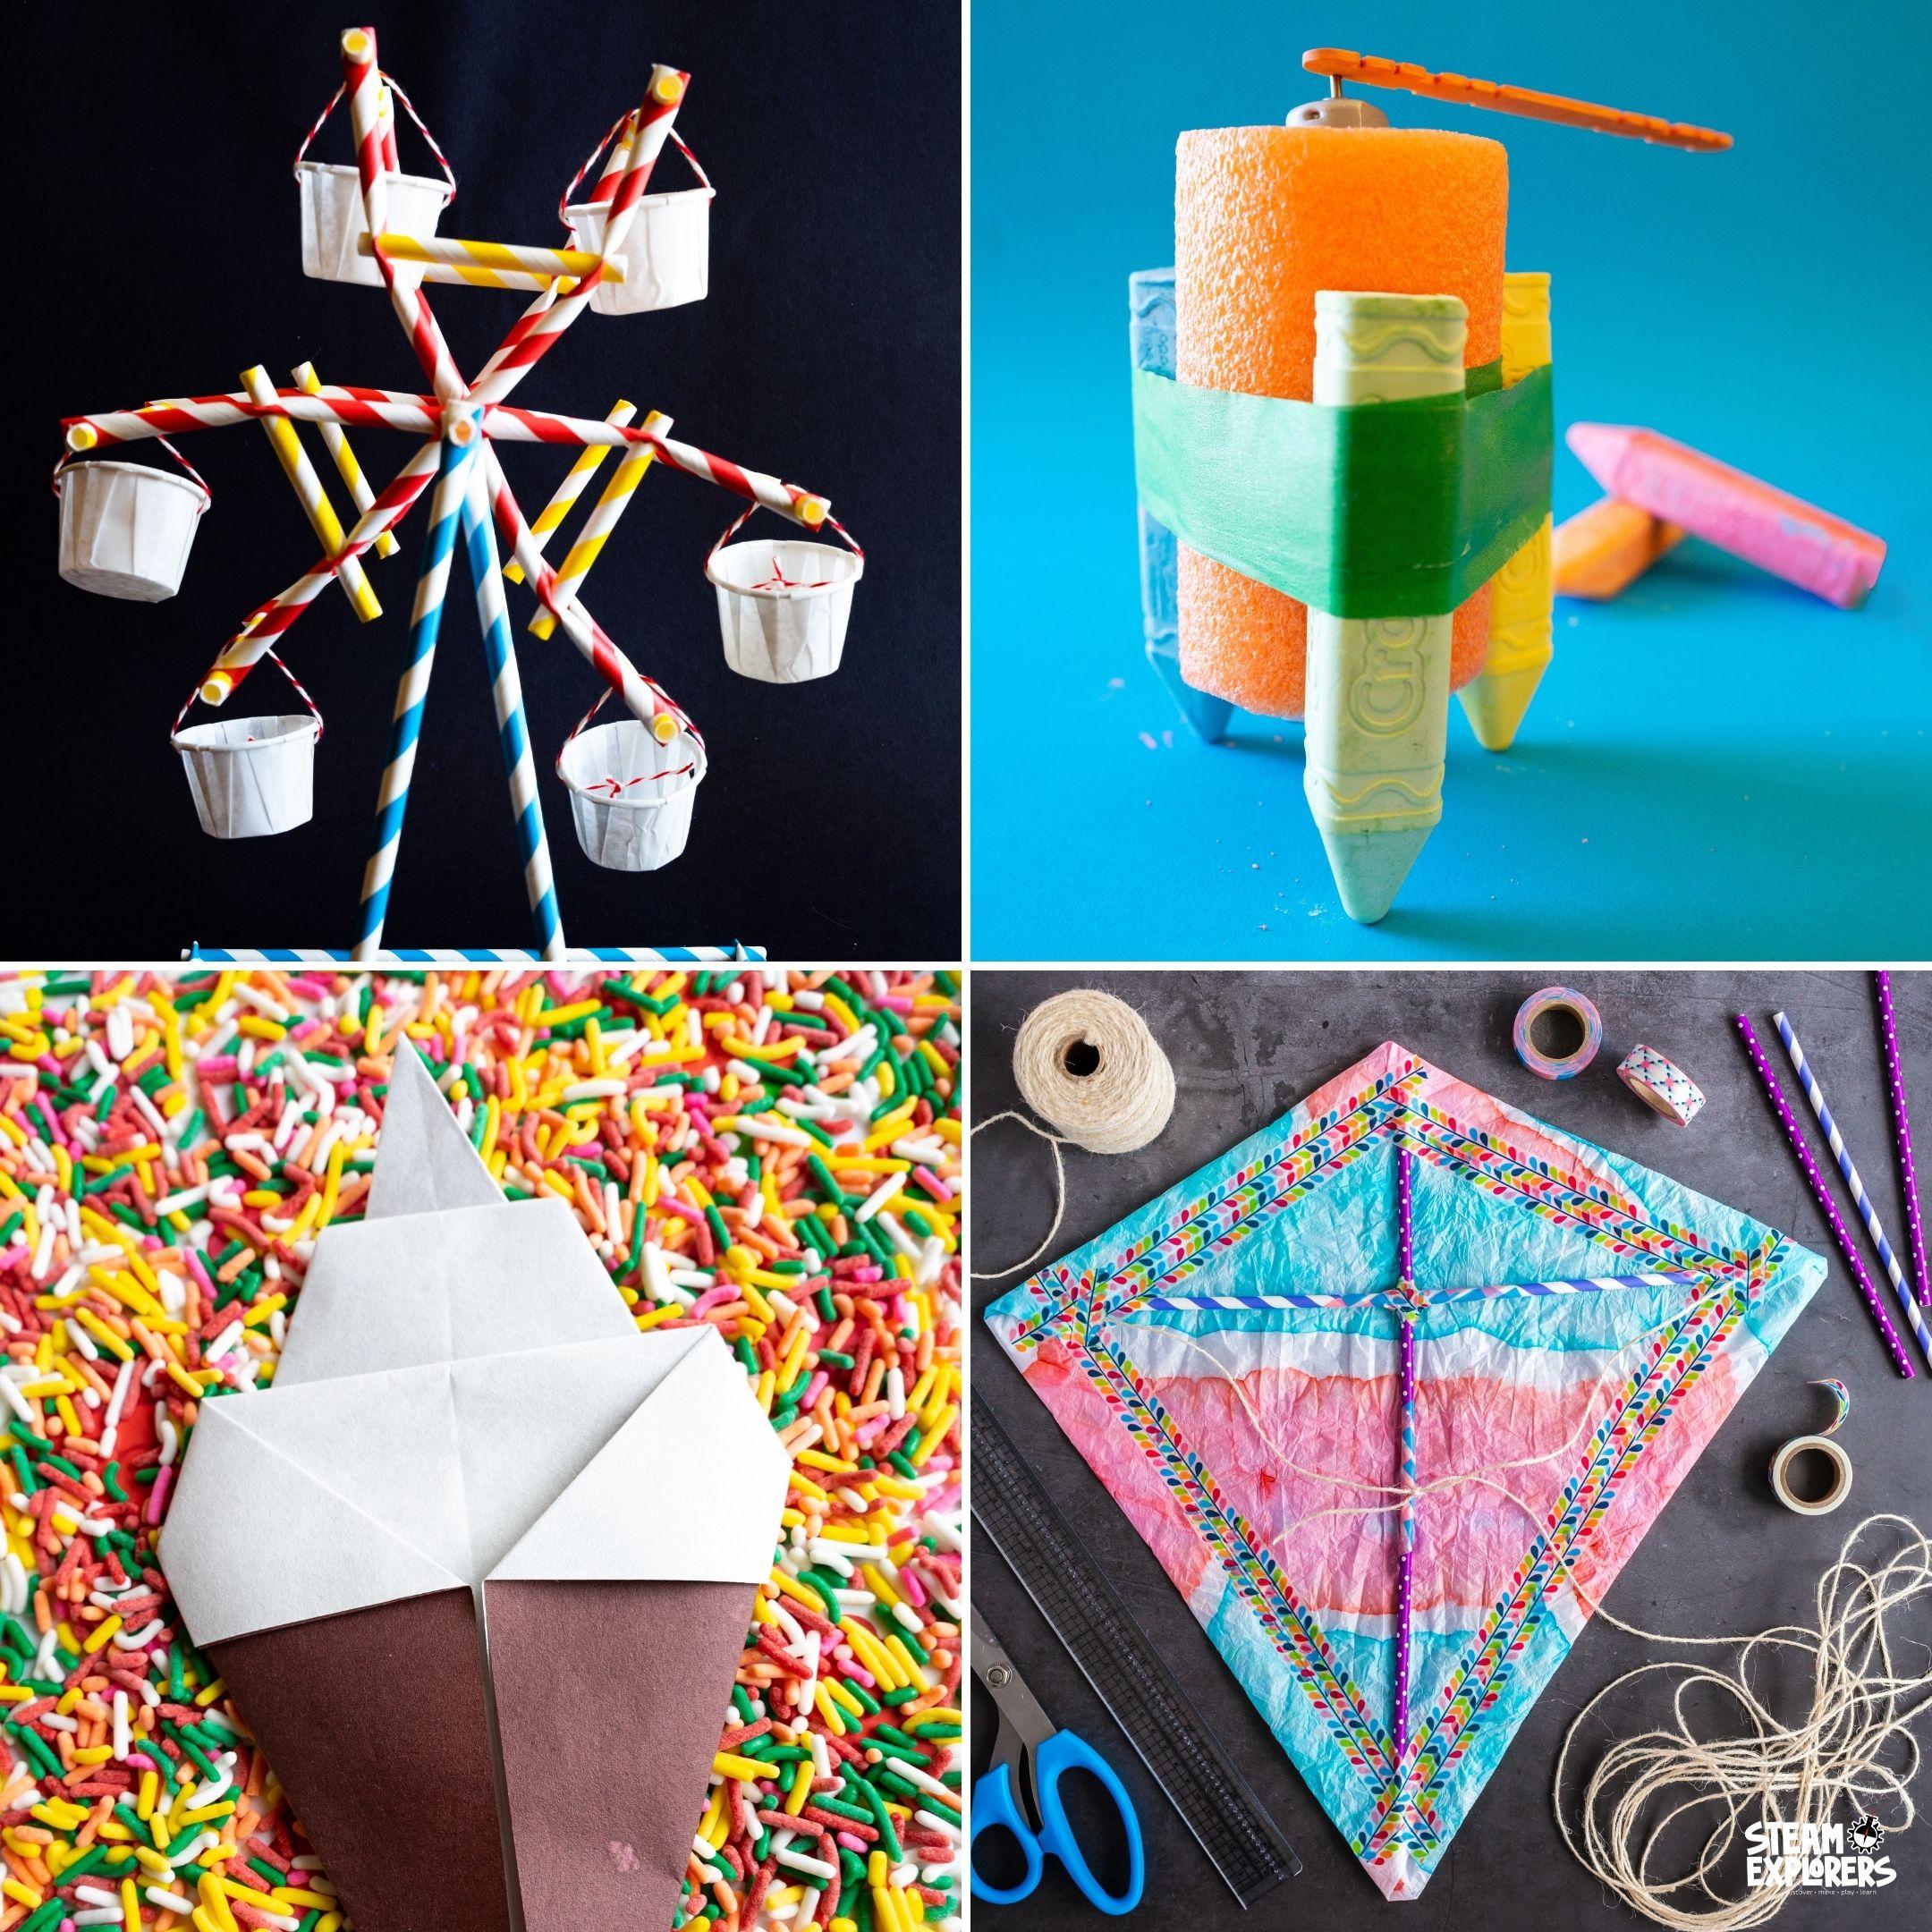 straw ferris wheel, chalk bot, ice cream cone origami, tie dyed paper kite collage